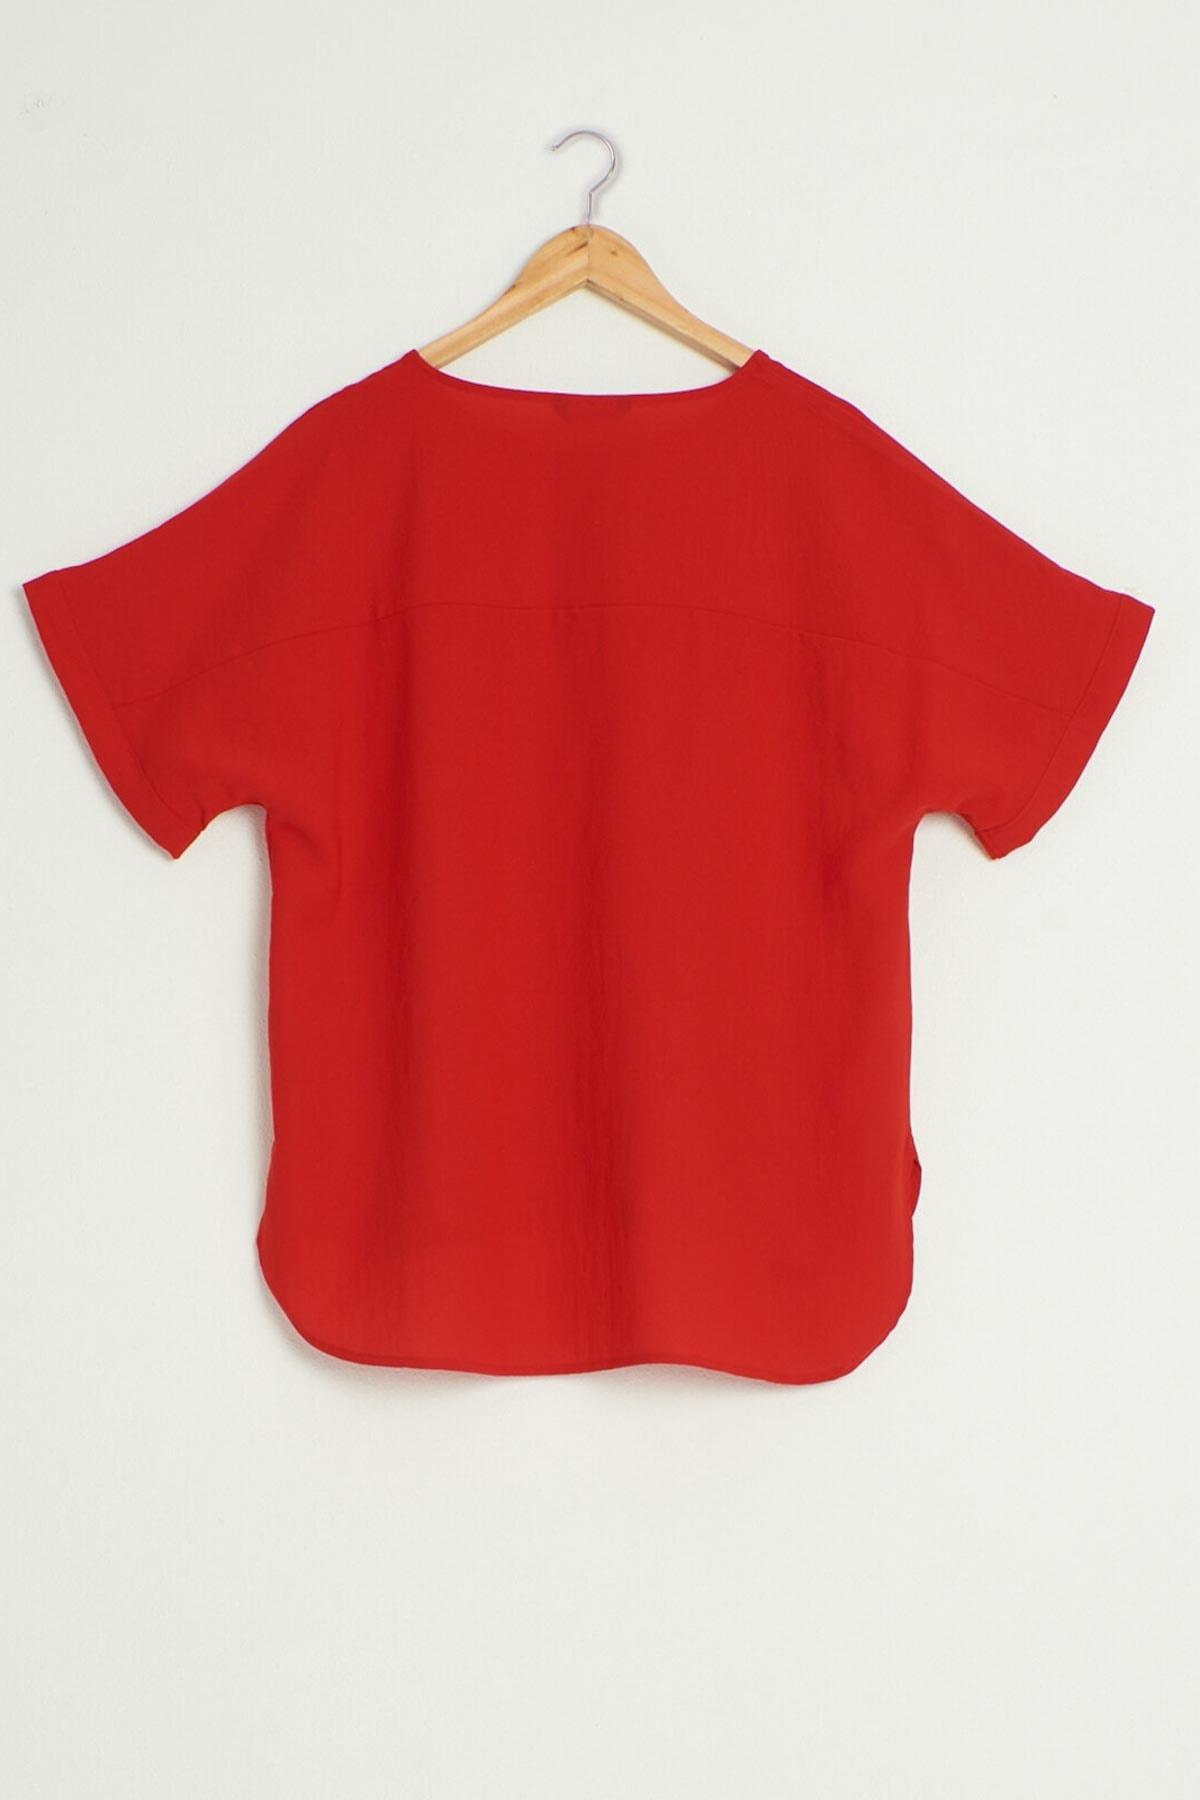 LC Waikiki Kadın Kırmızı Bluz 0WDI16Z8 2